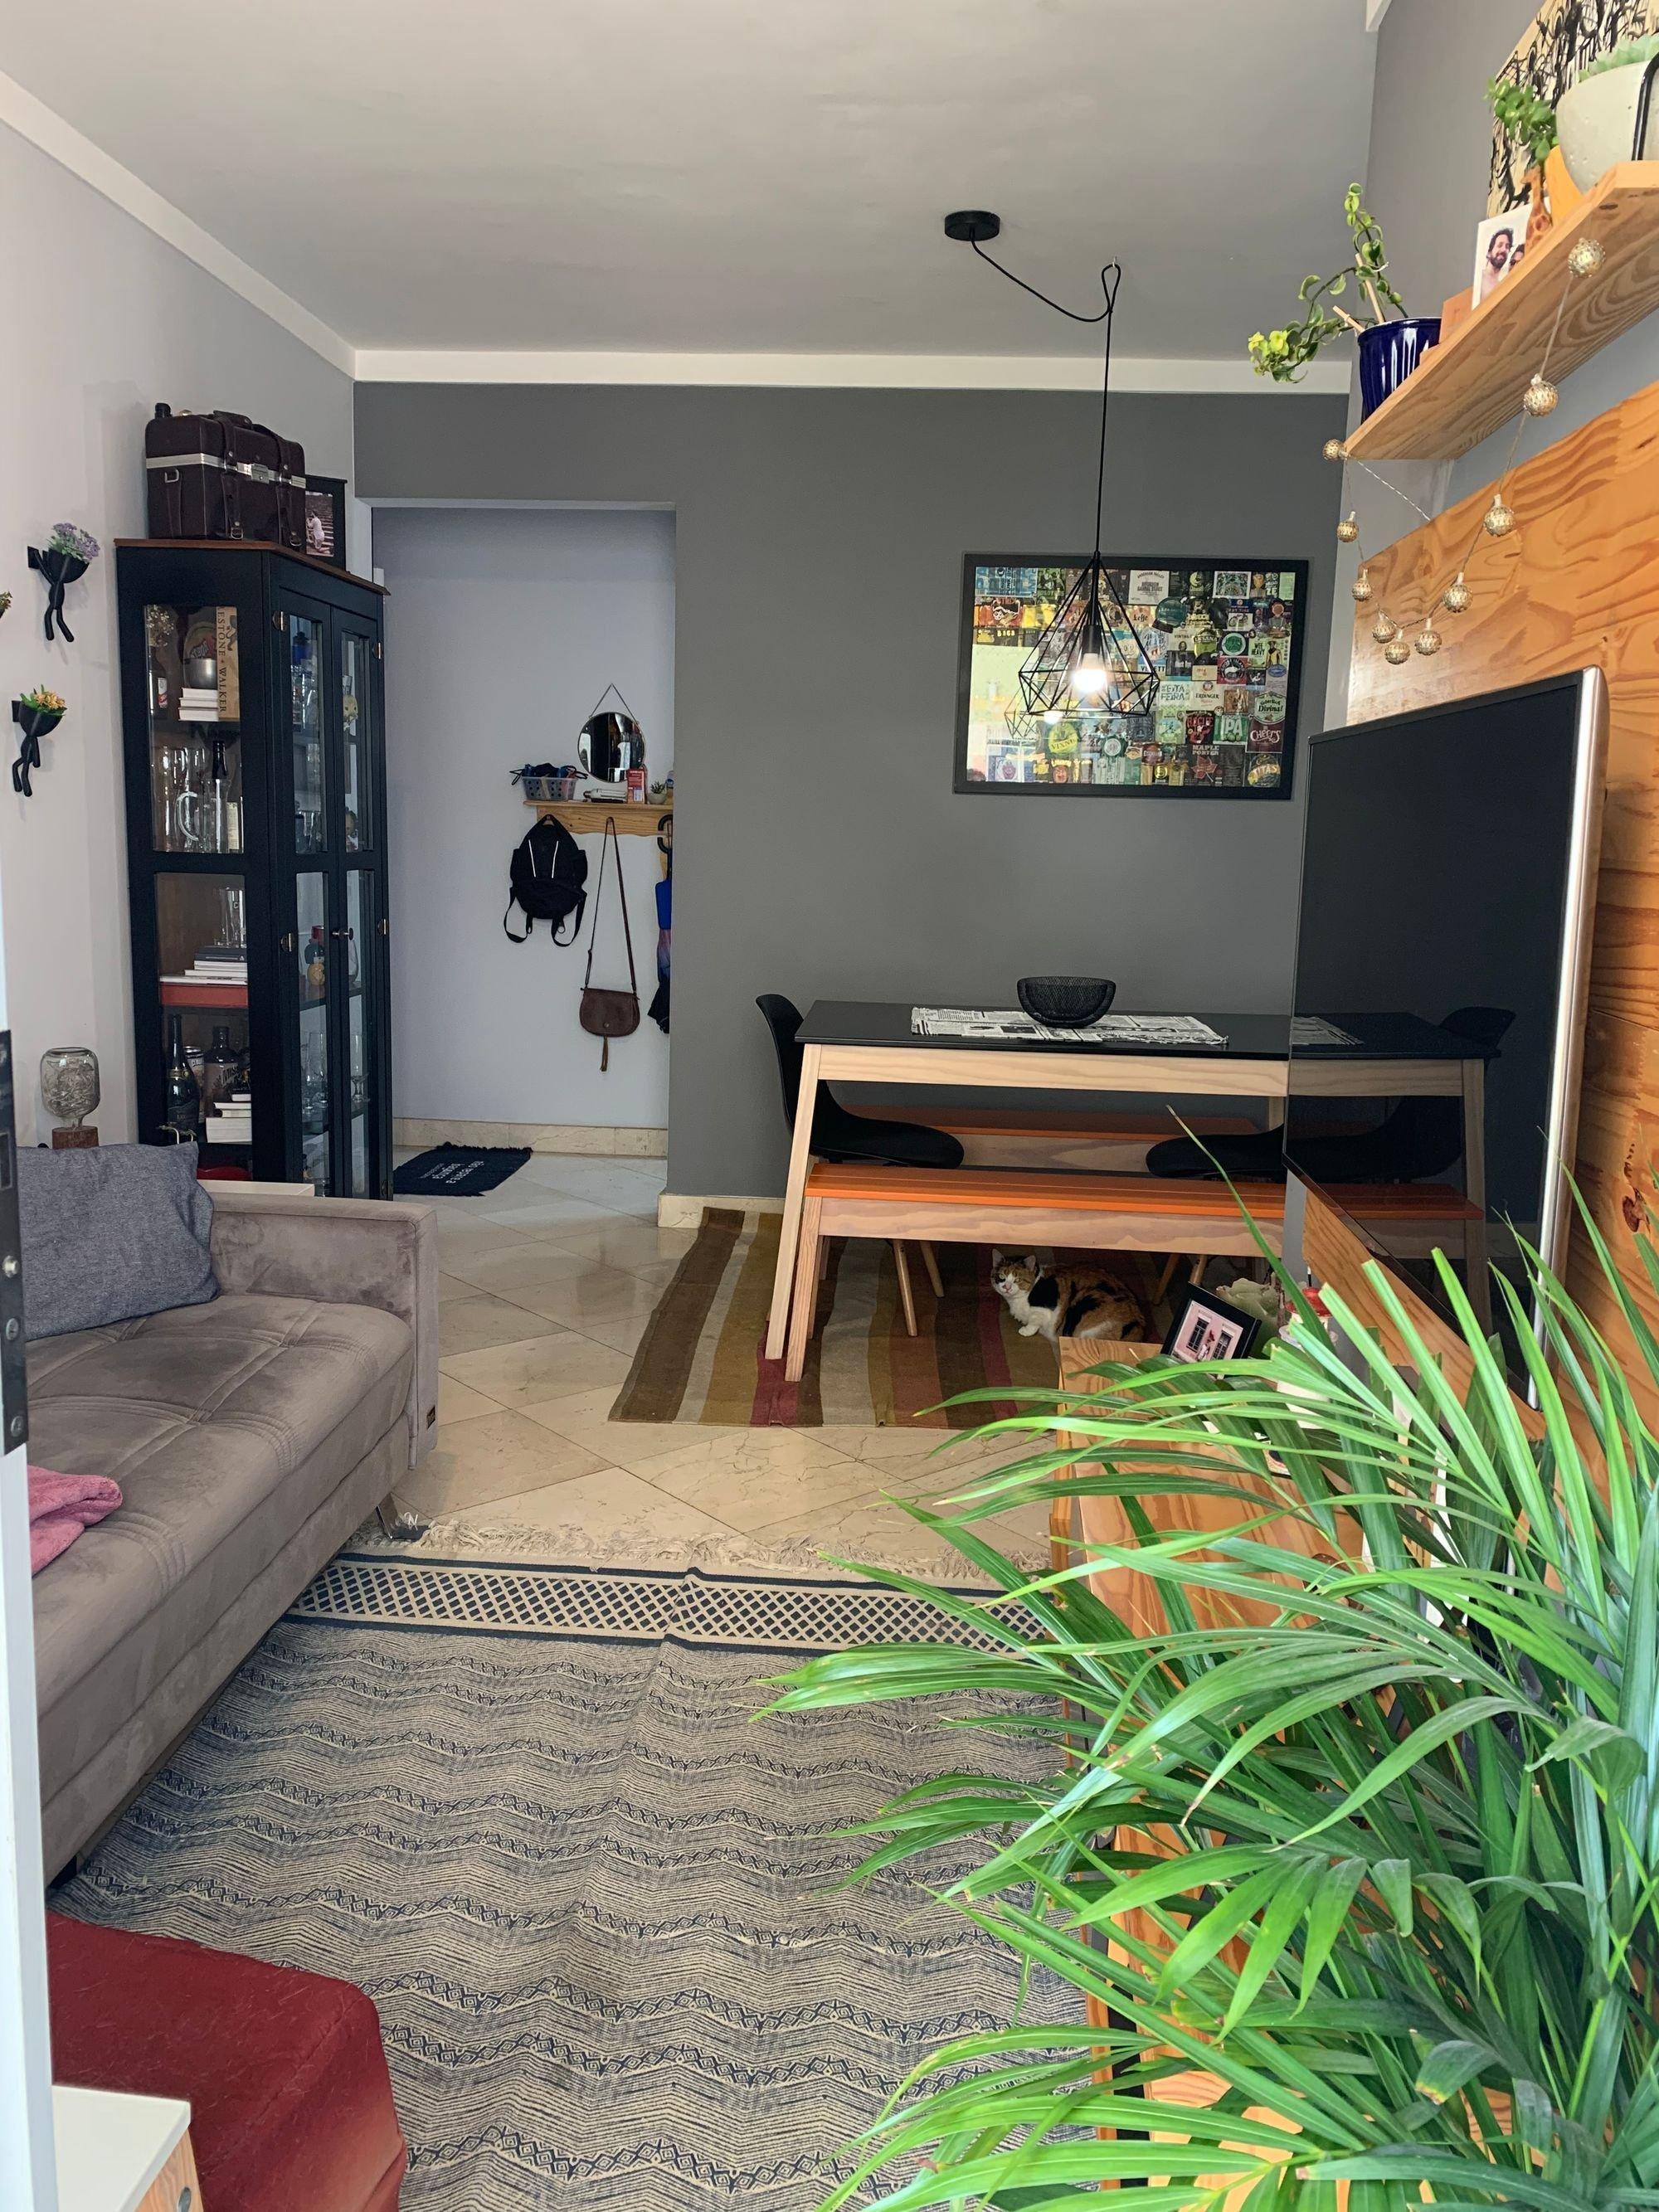 Foto de Sala com vaso de planta, sofá, televisão, garrafa, tigela, mesa de jantar